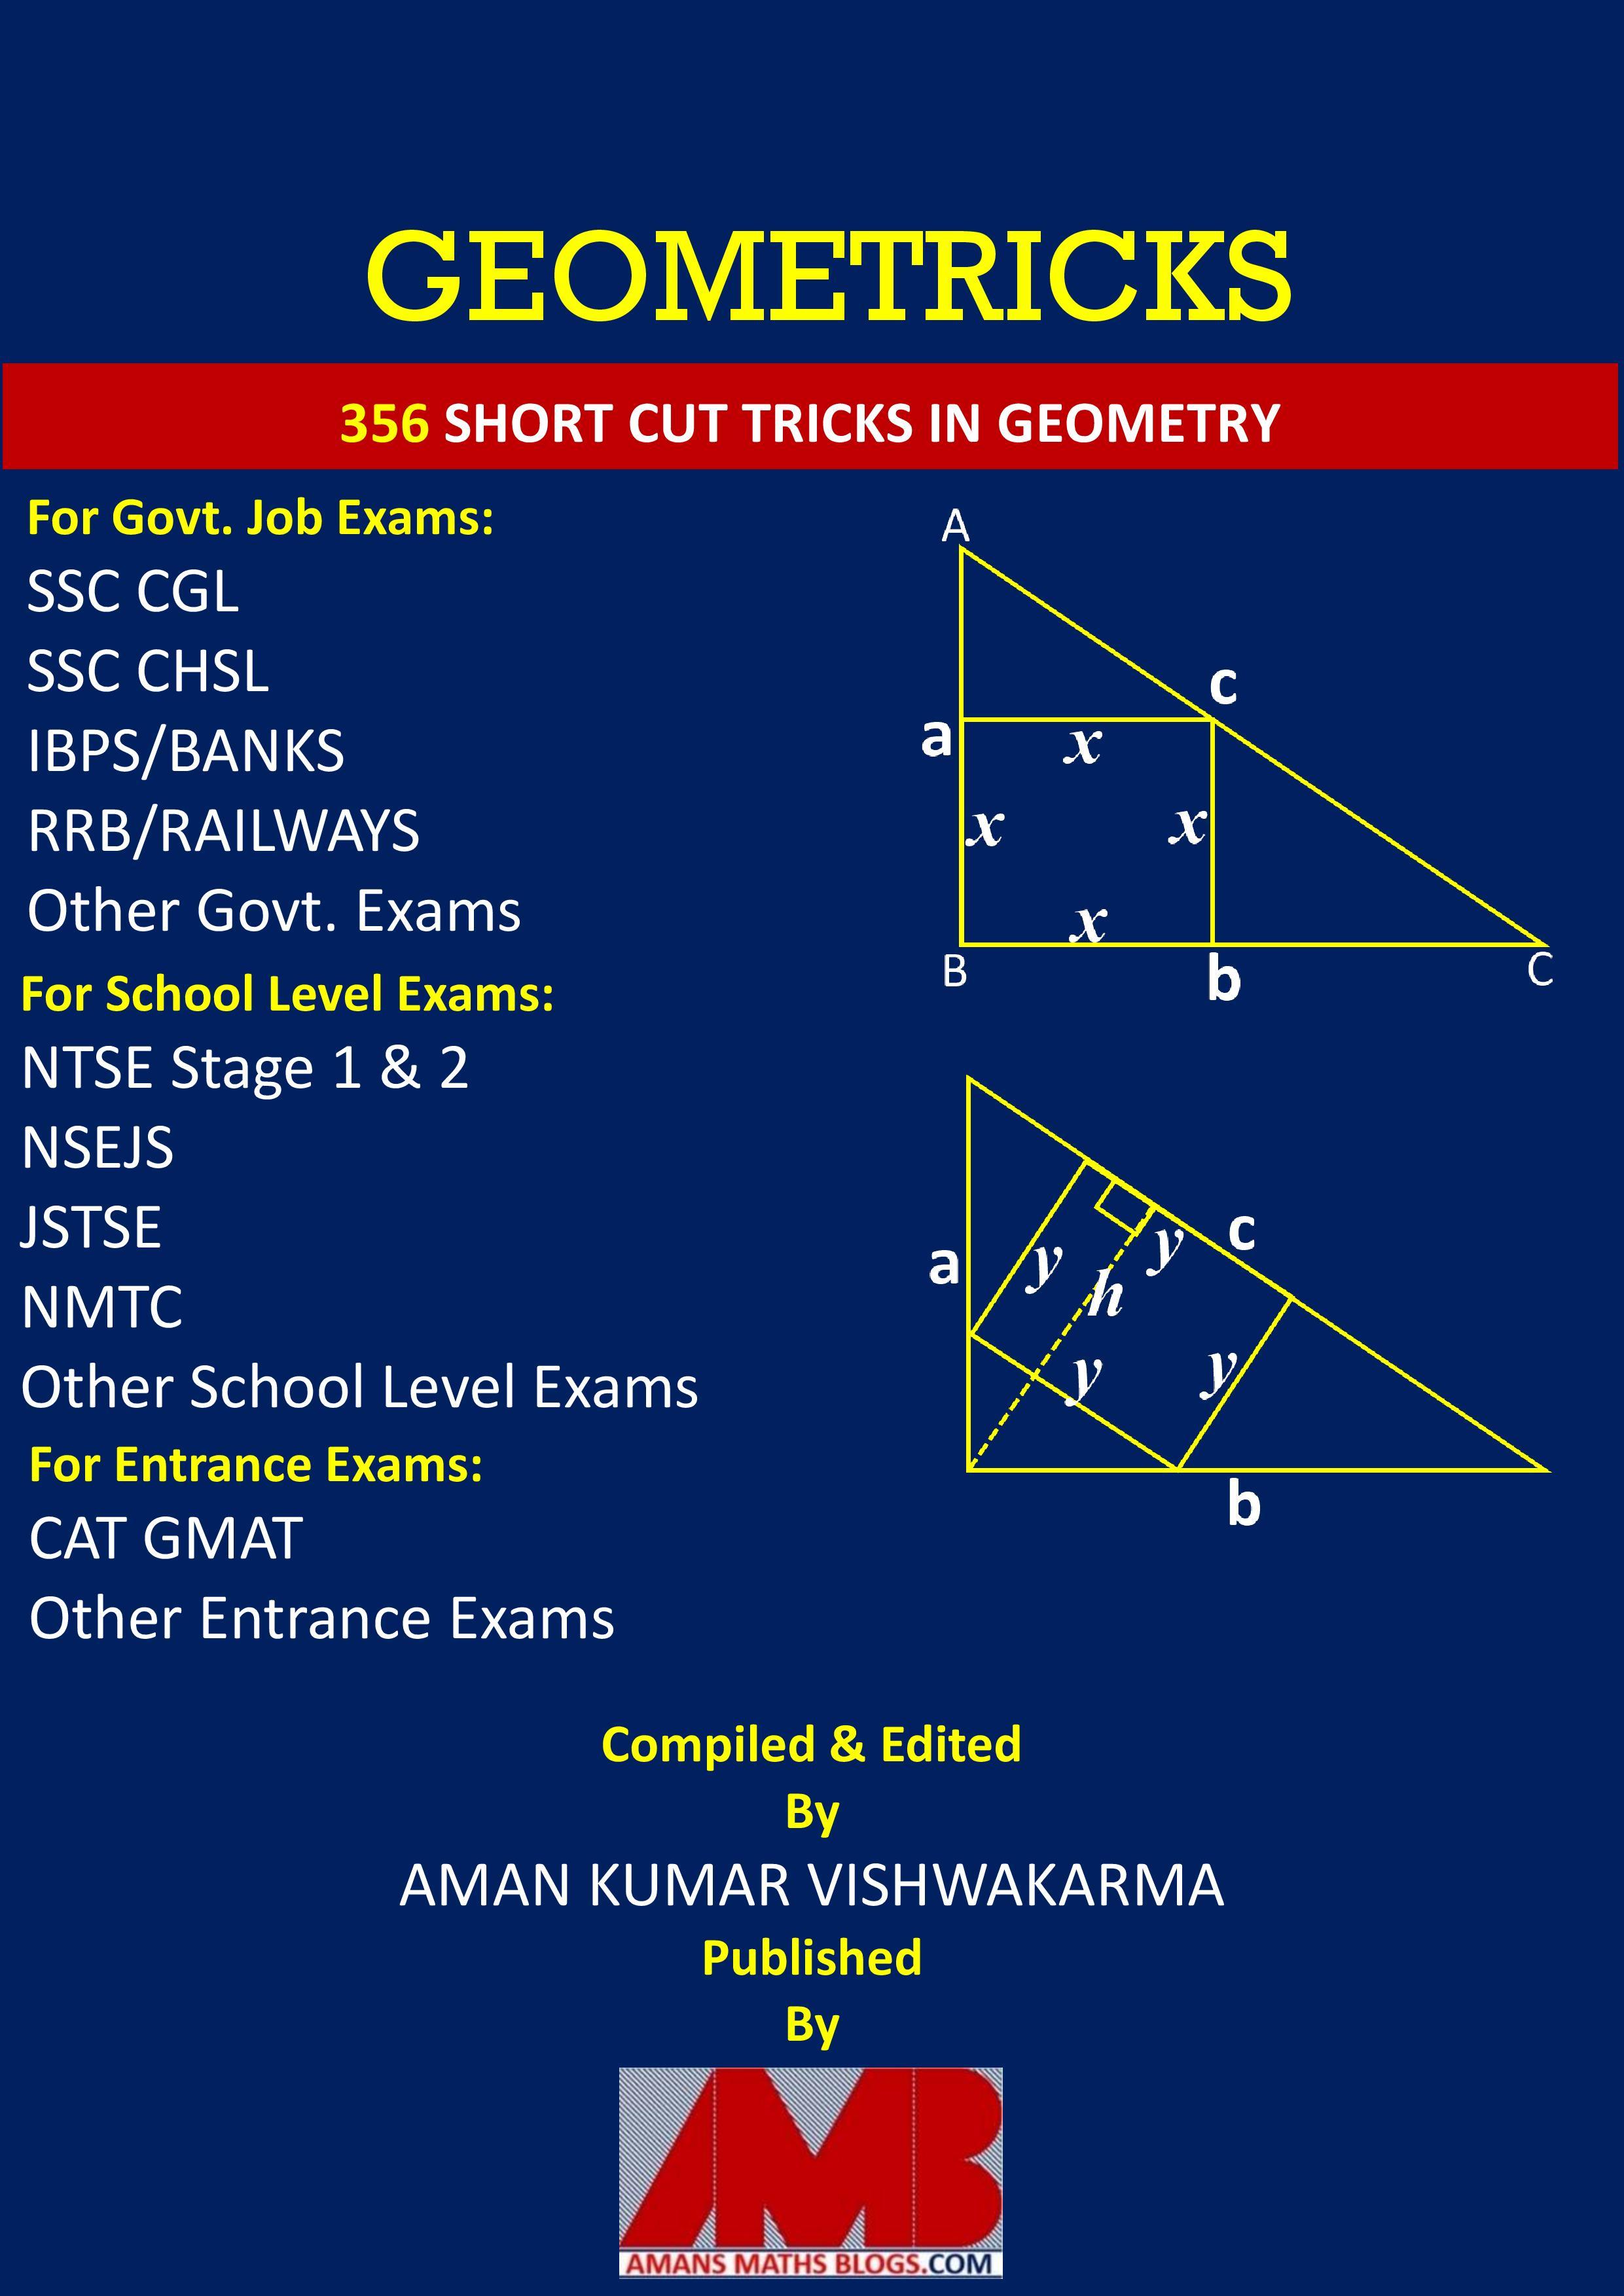 all-short-tricks-in-geometry-geometricks-ebook-for-ssc-cgl-ibps-rrb-cat-gmat